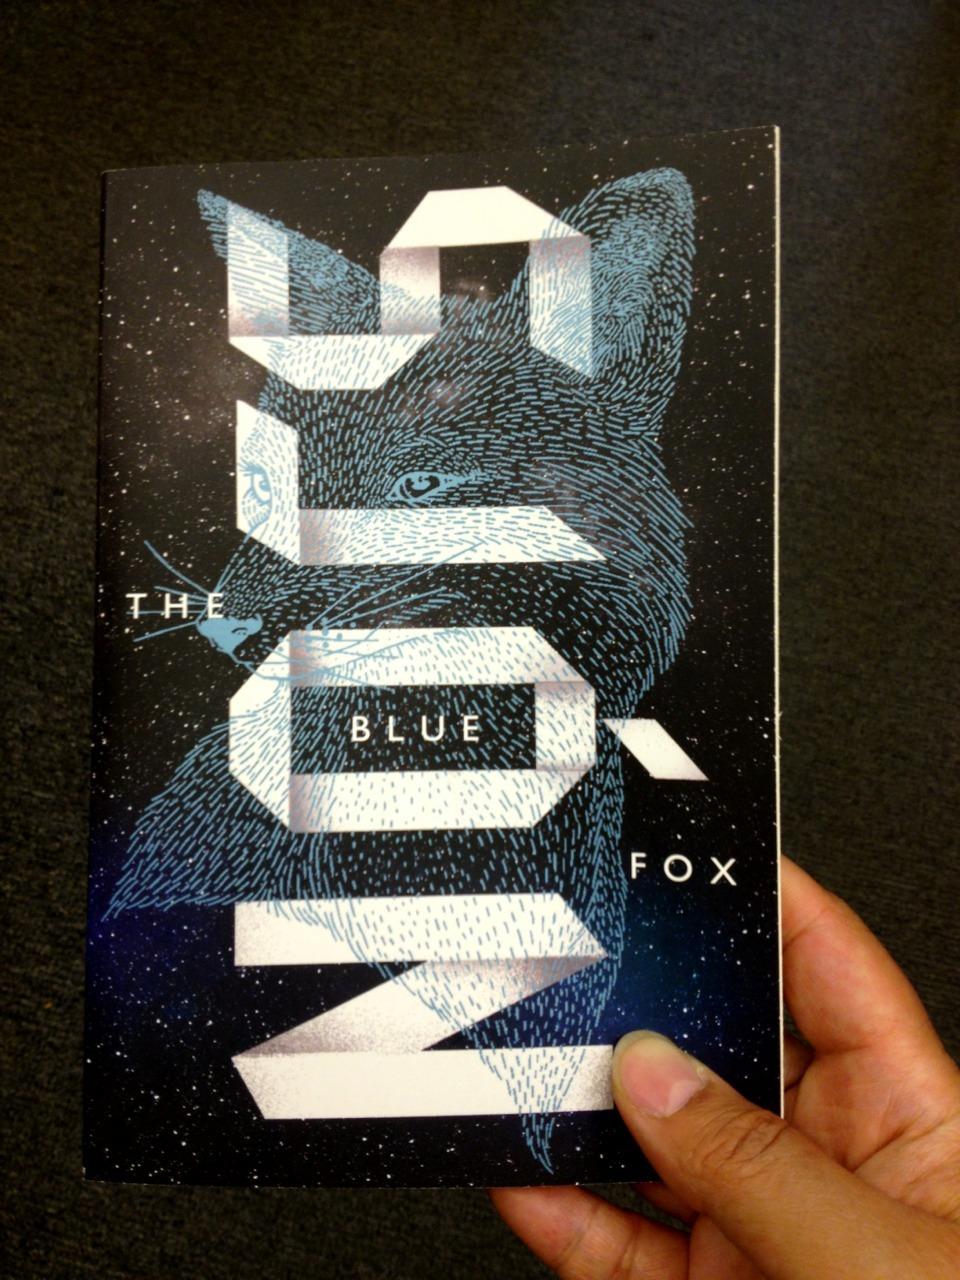 Sjon, The Blue Fox (read on the plane) http://sjon.siberia.is/